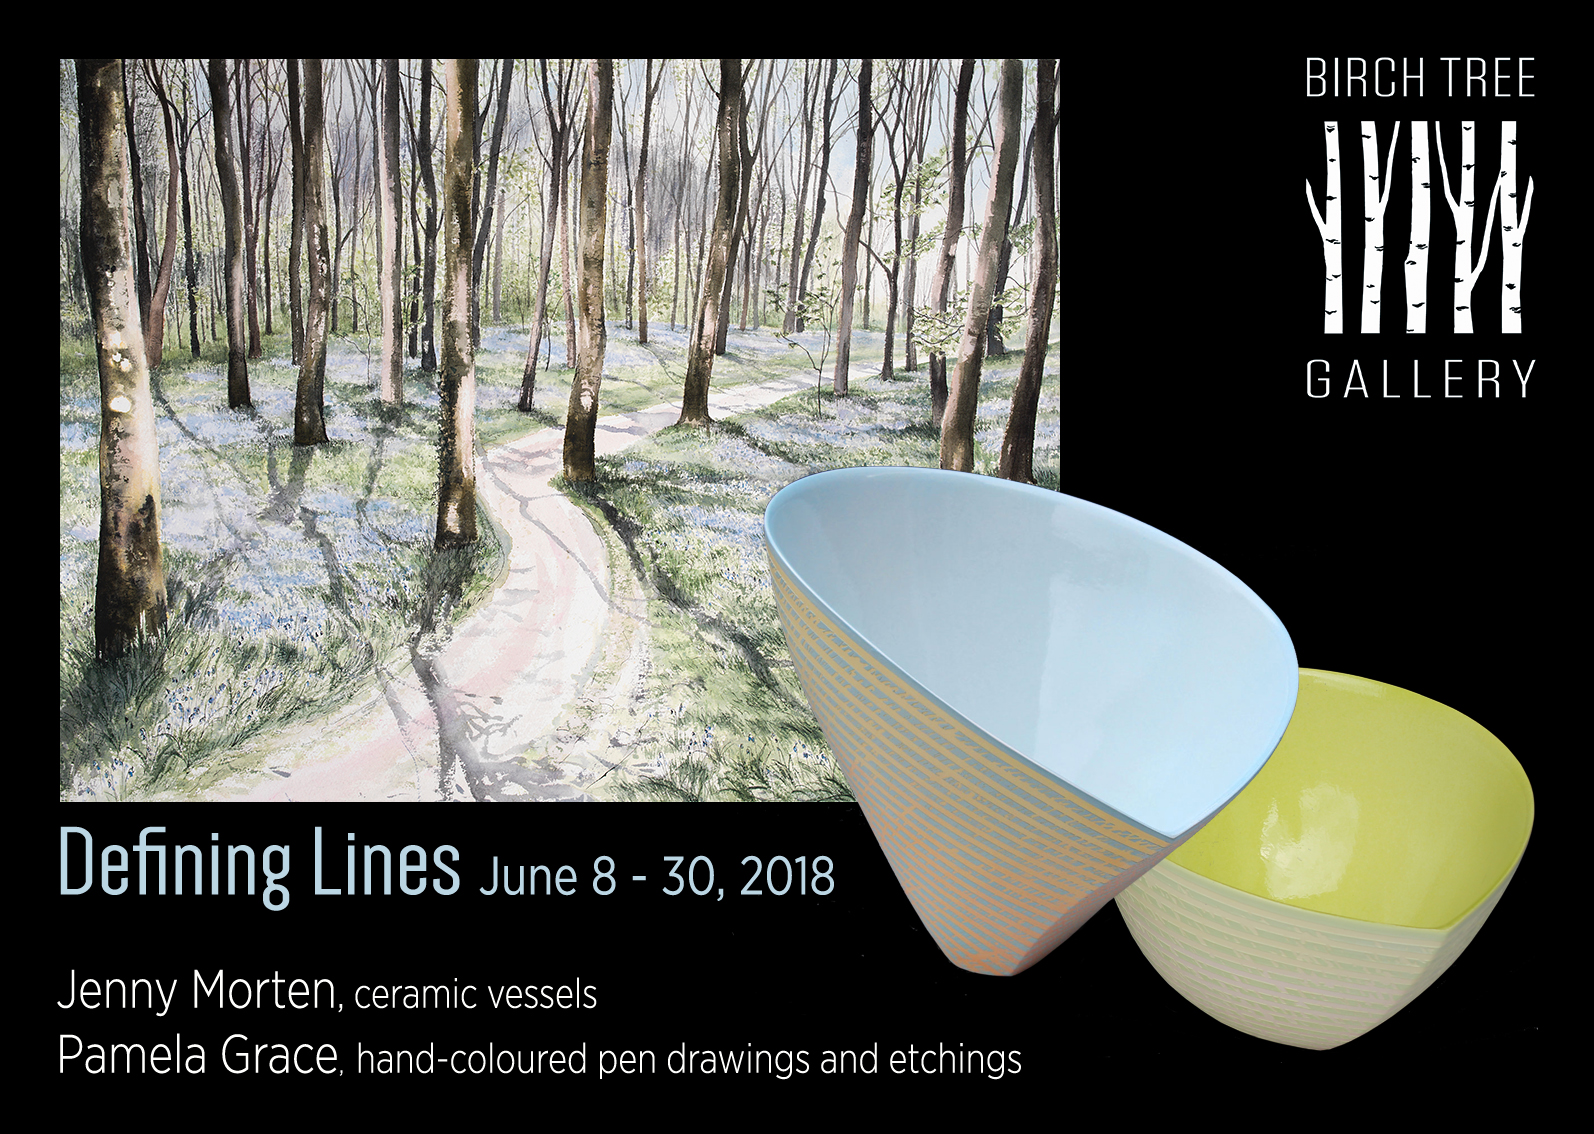 Birch Tree Gallery: Defining Lines